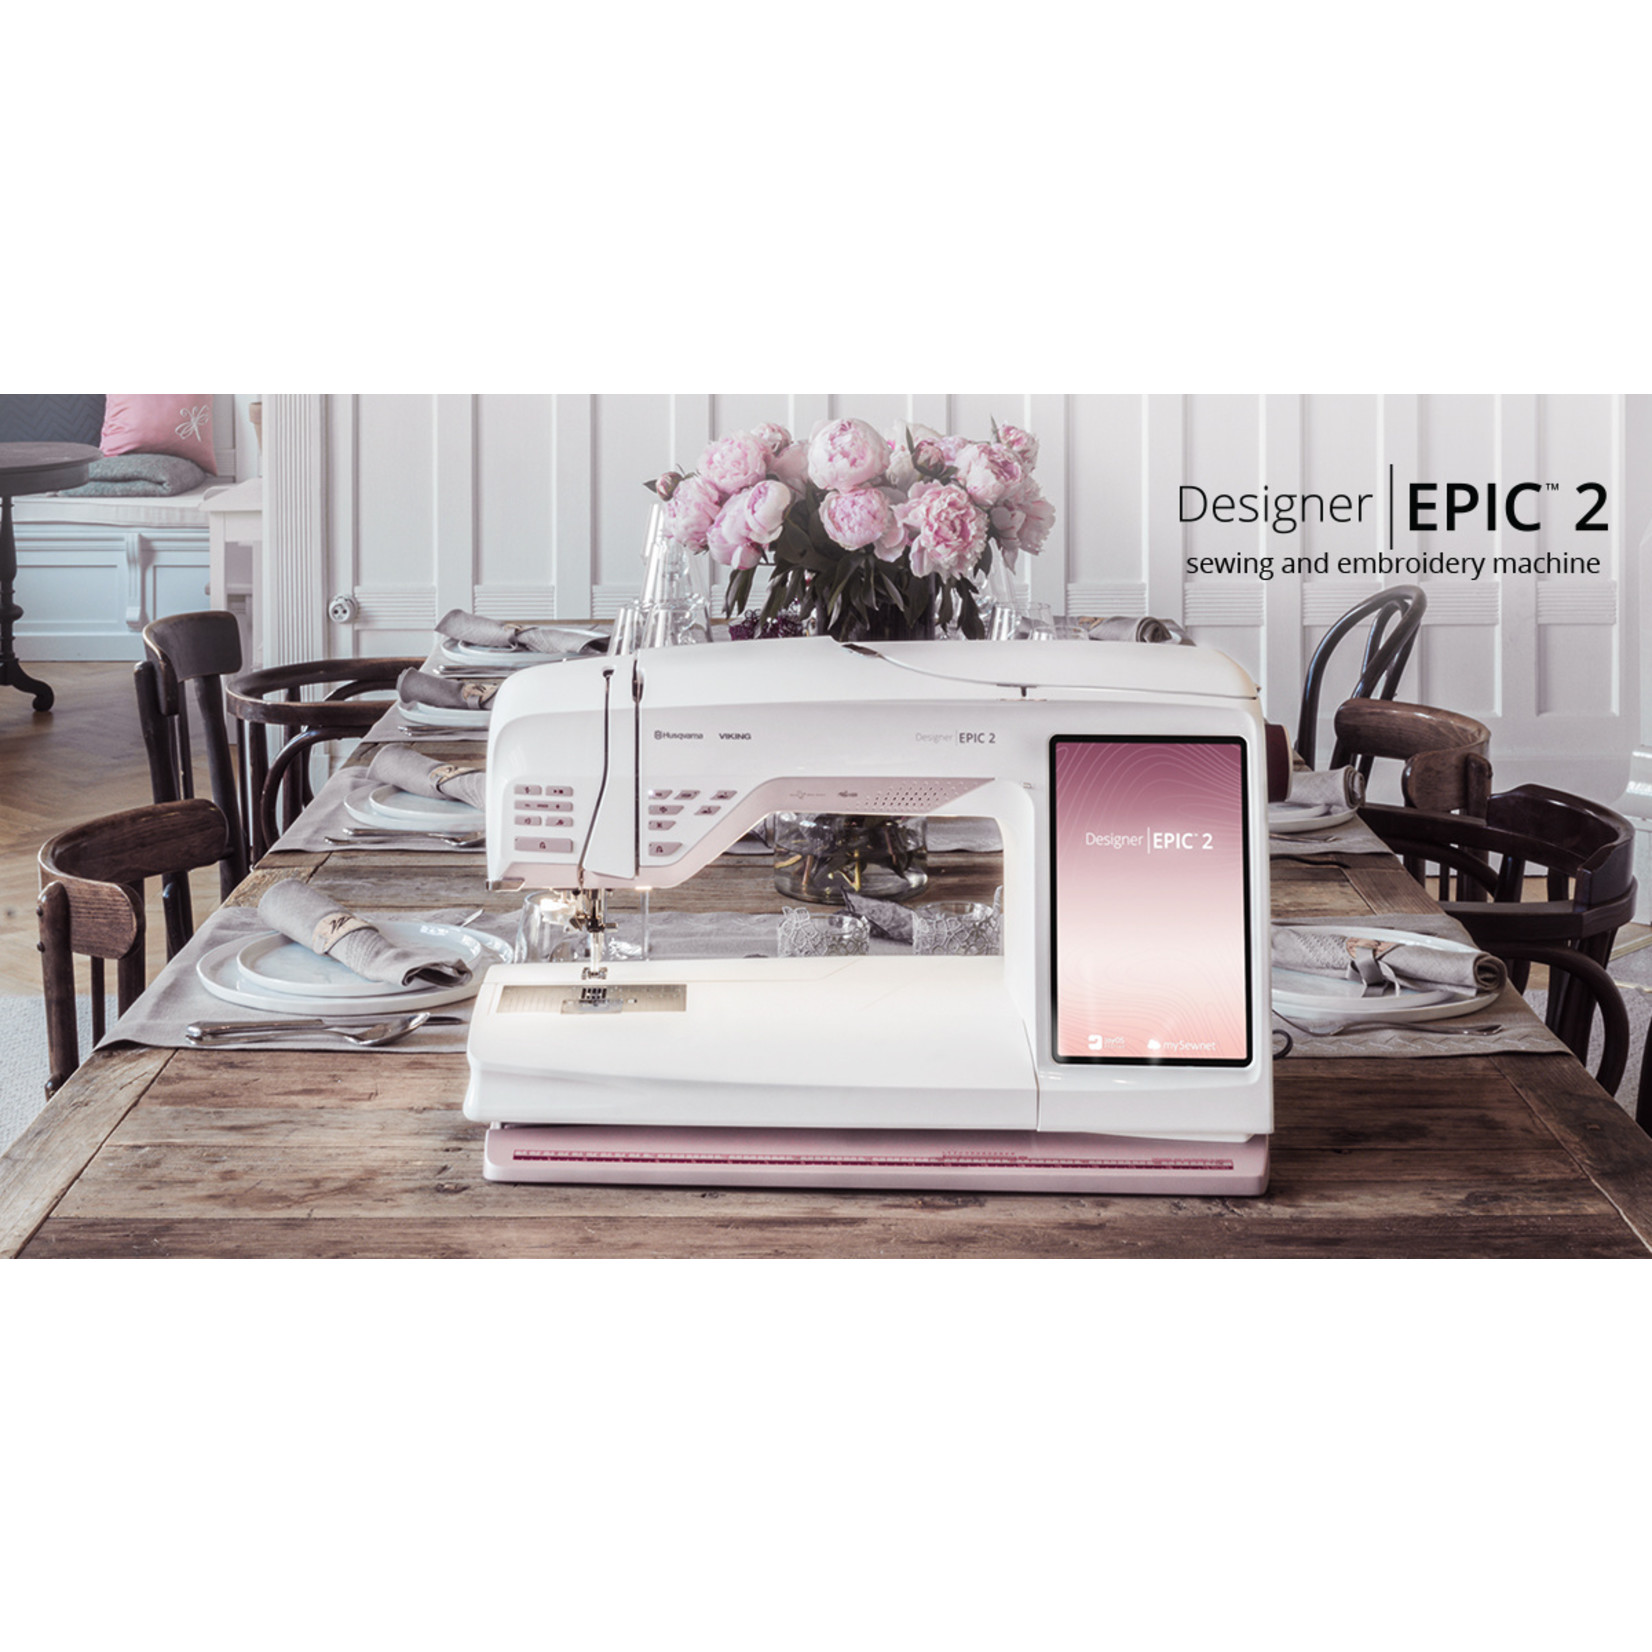 HUSQVARNA VIKING DESIGNER EPIC™ 2